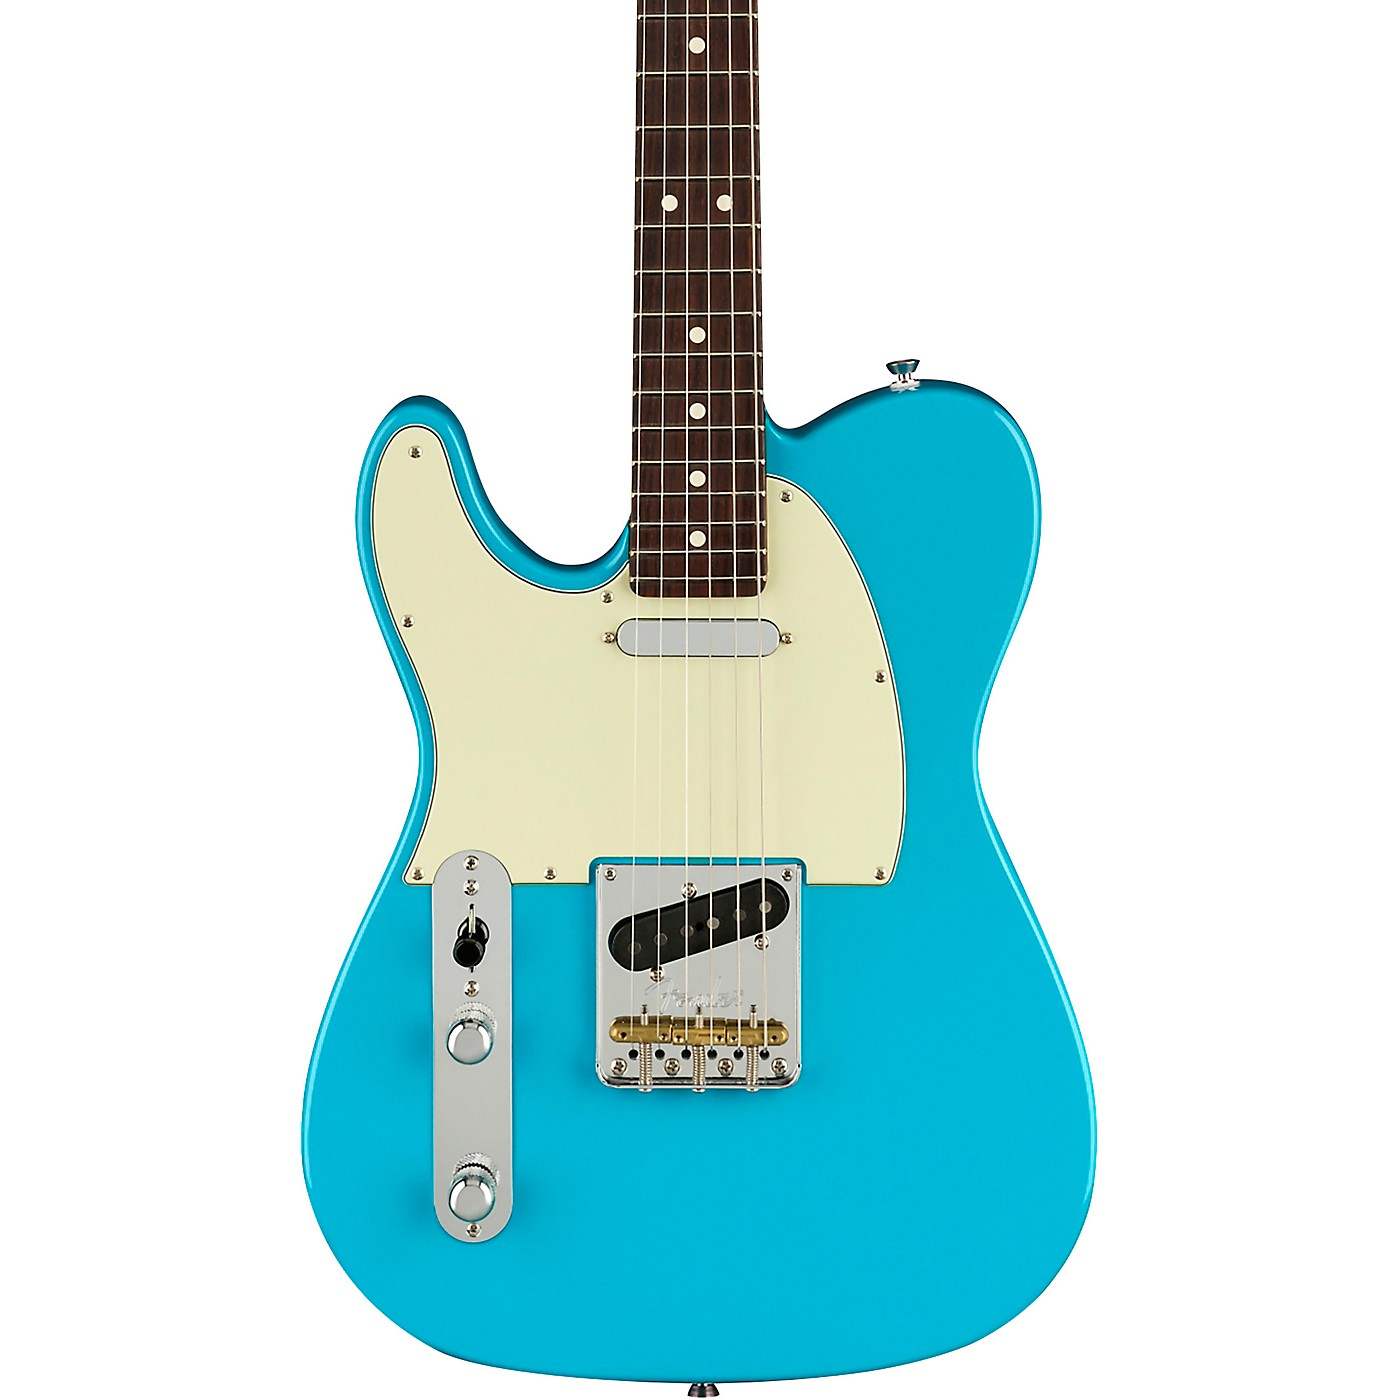 Fender American Professional II Telecaster Rosewood Fingerboard Left-Handed Electric Guitar thumbnail